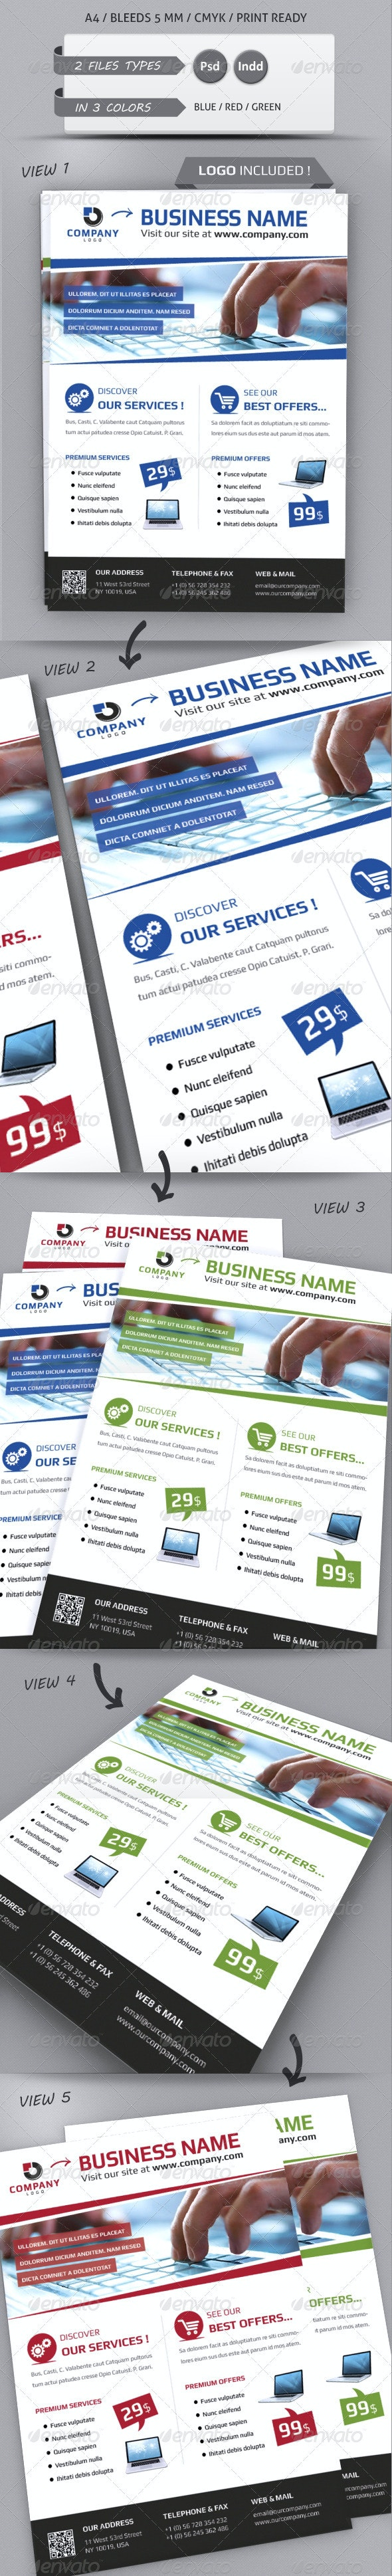 MODERN BUSINESS FLYER TEMPLATE A4 - Commerce Flyers